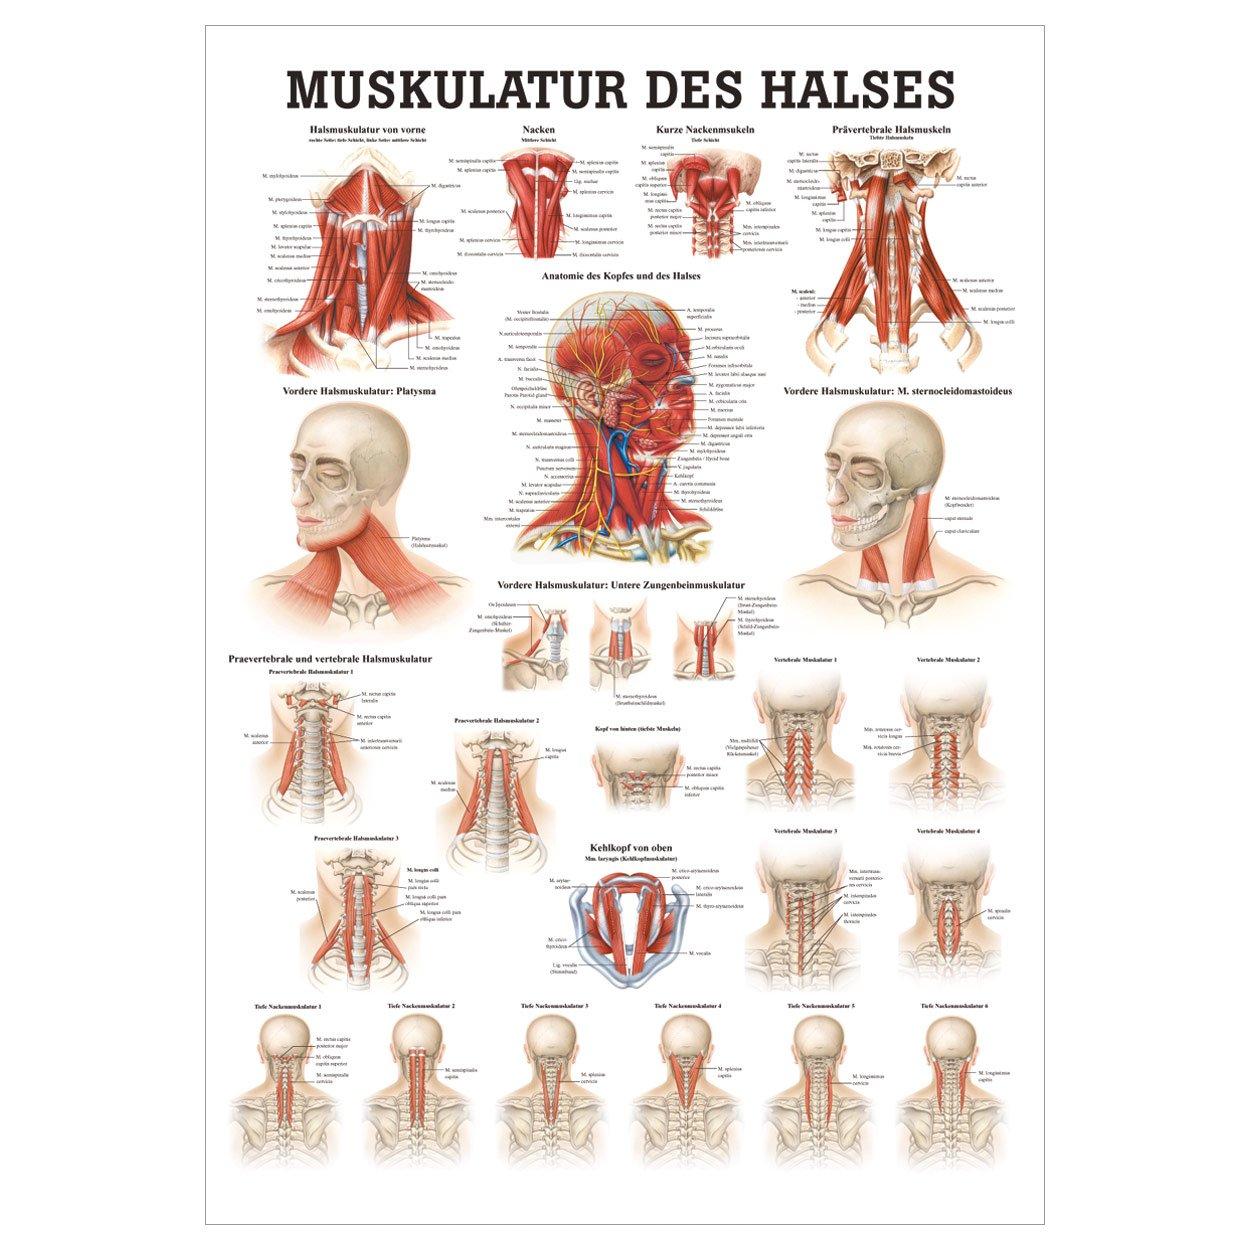 Muskulatur des Halses Mini-Poster Anatomie 34x24 cm medizinische ...